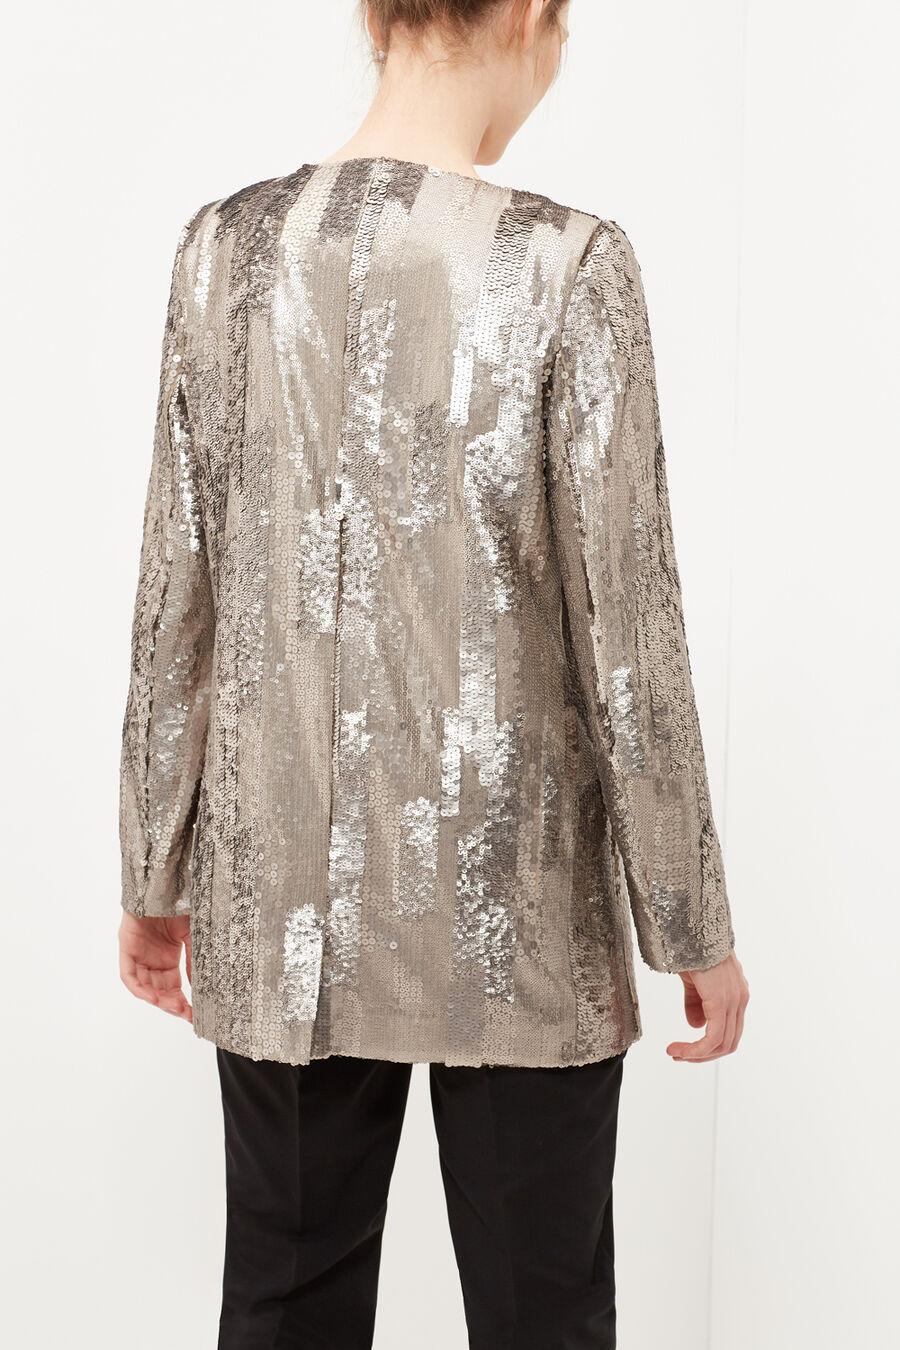 Sequined blazer